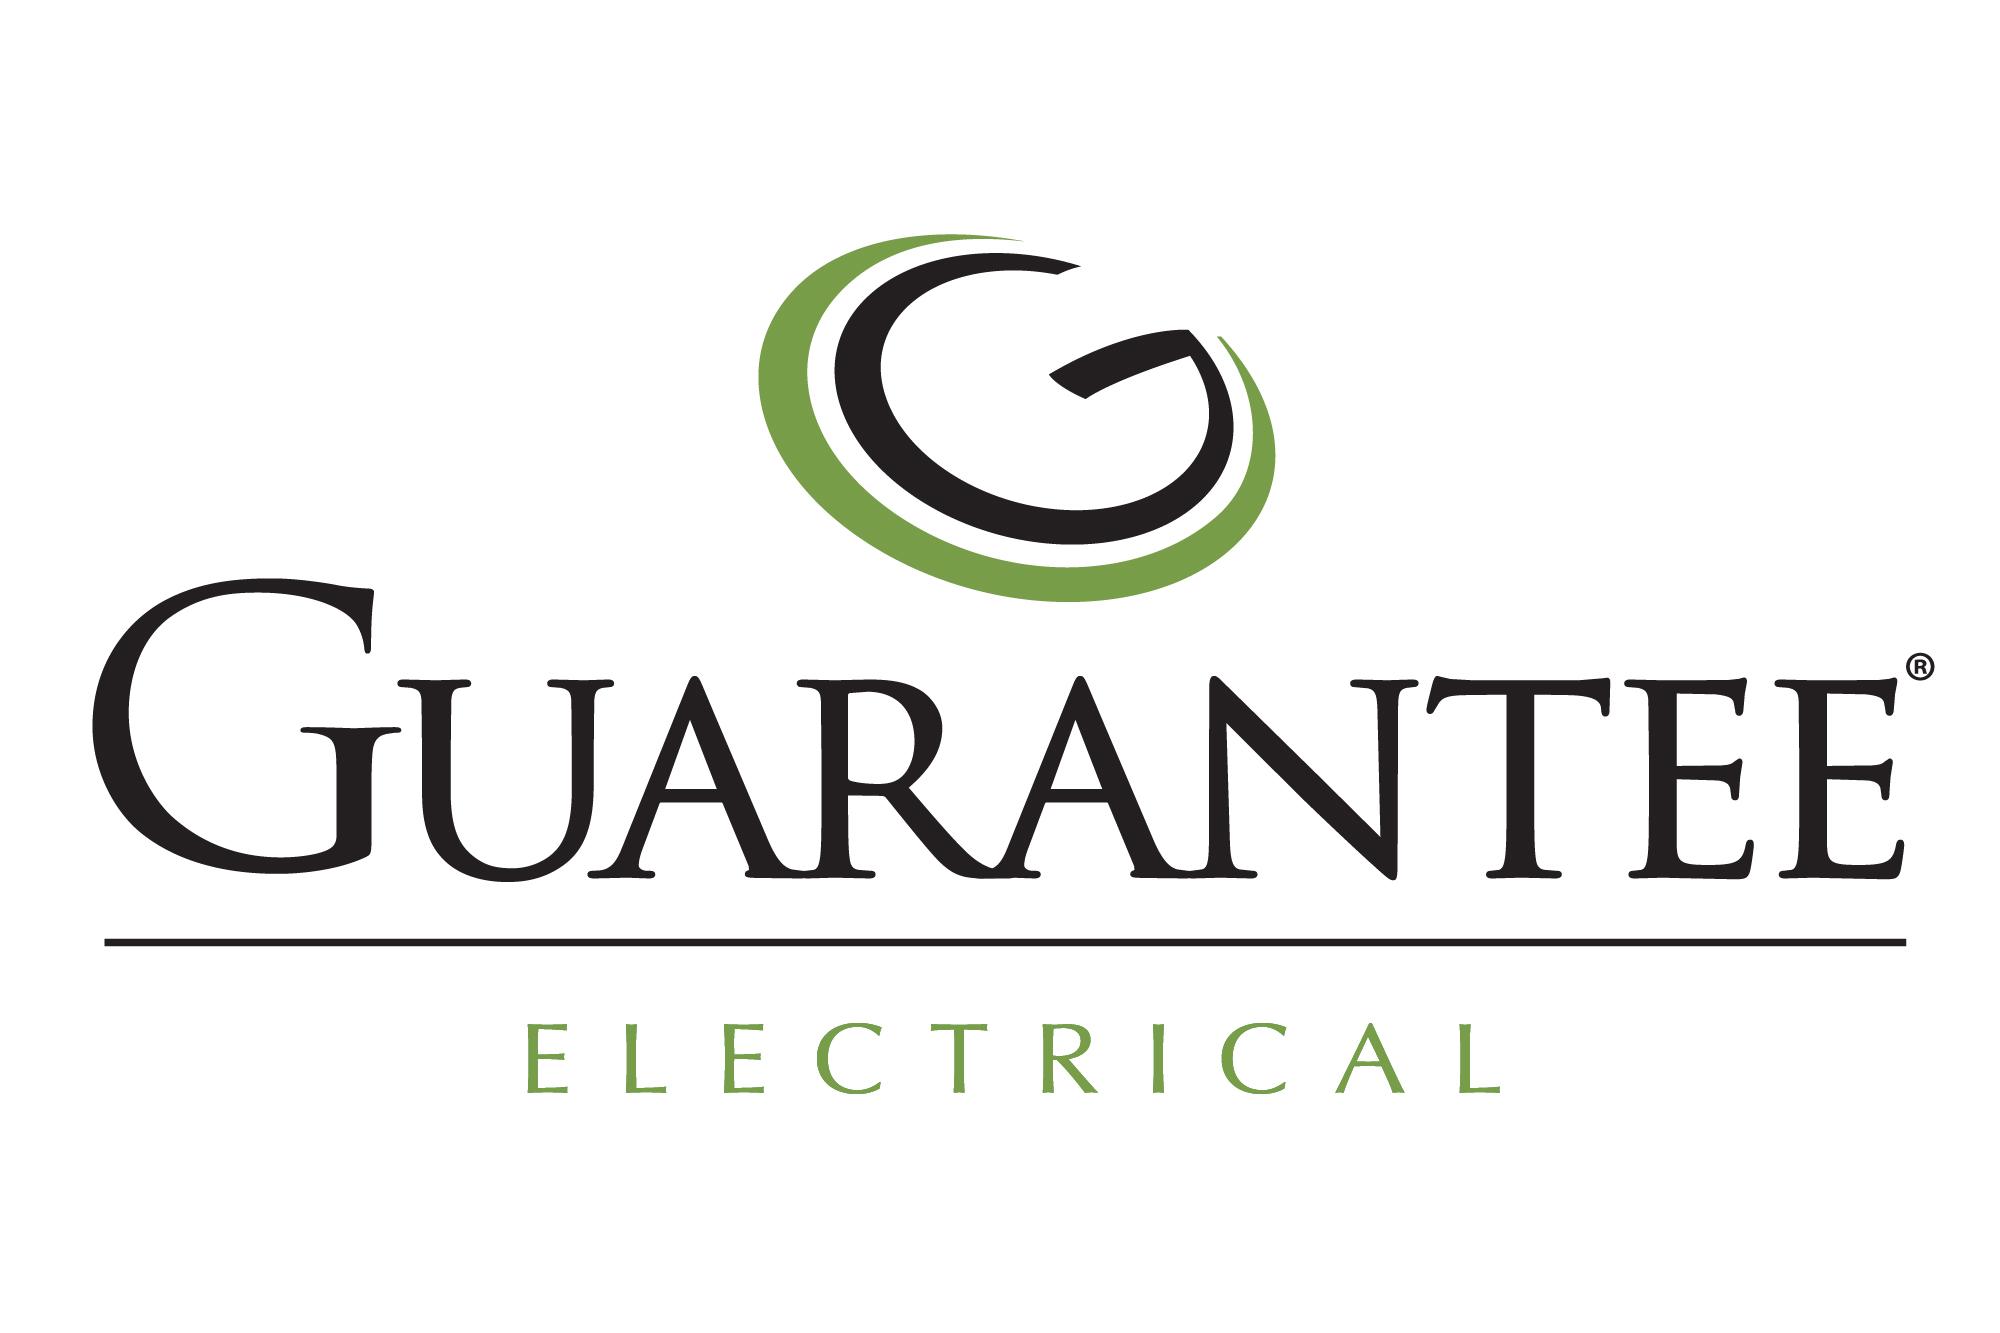 Guarantee Electrical Company logo